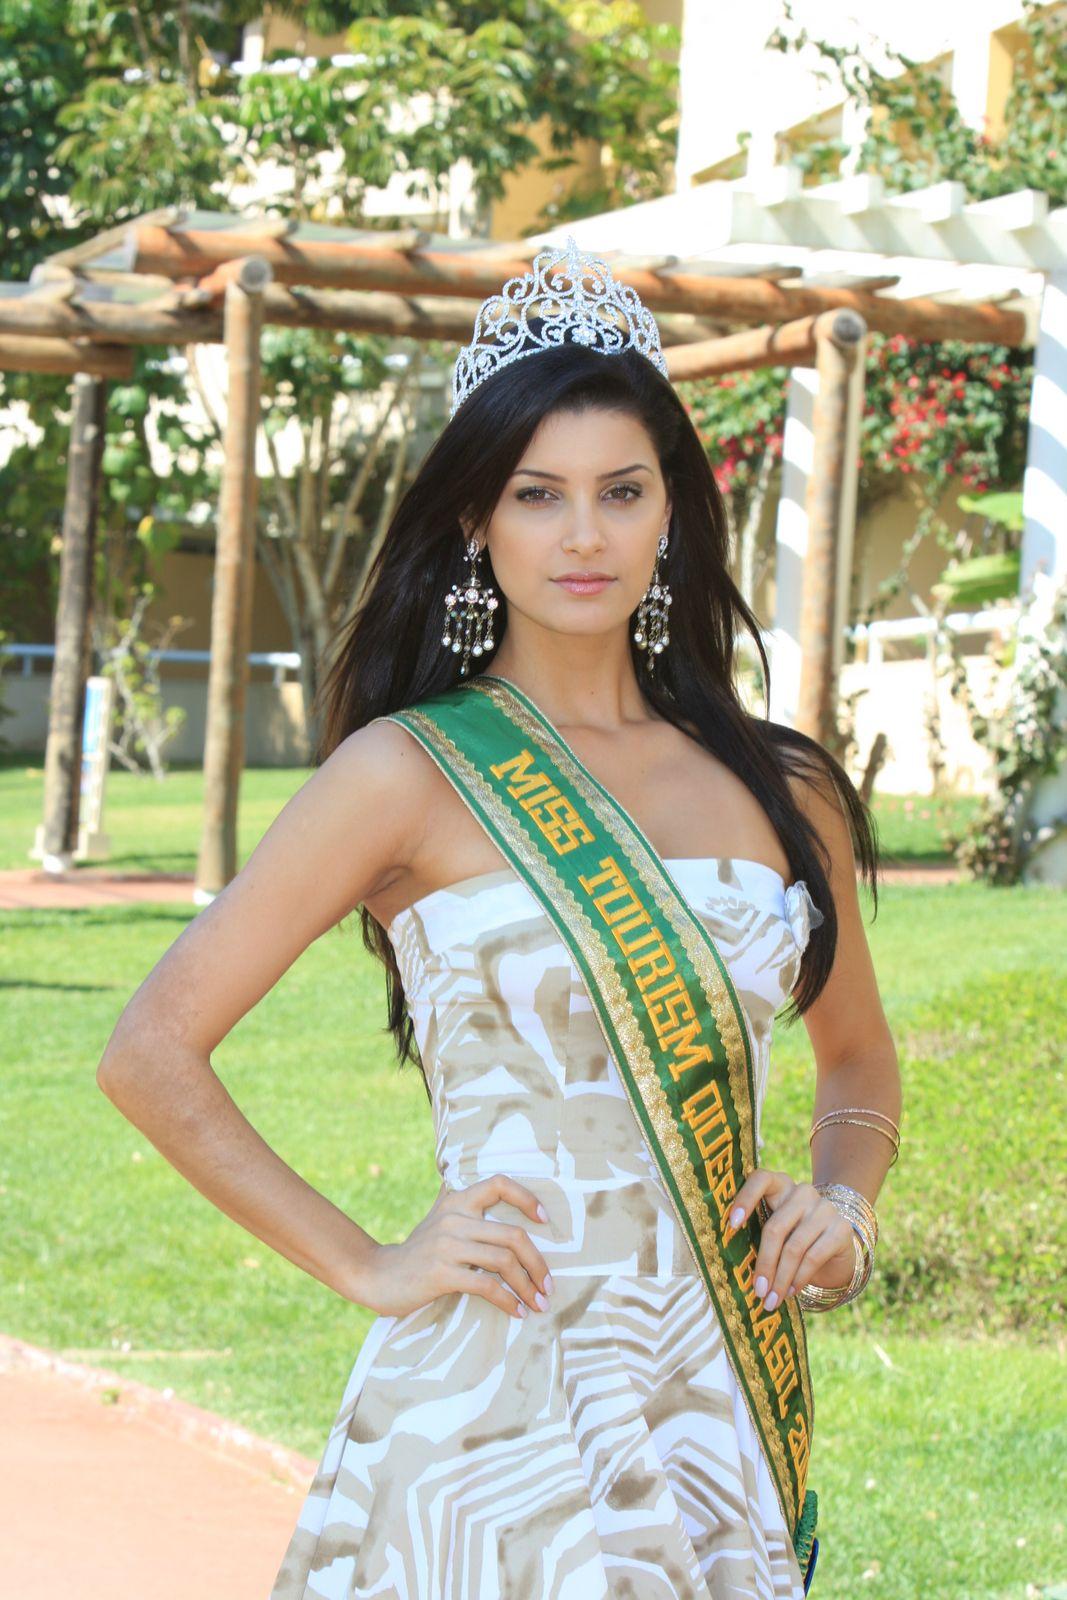 vivian noronha, rainha hispanoamericana 2008. suplente. - Página 4 Szwe7wxp